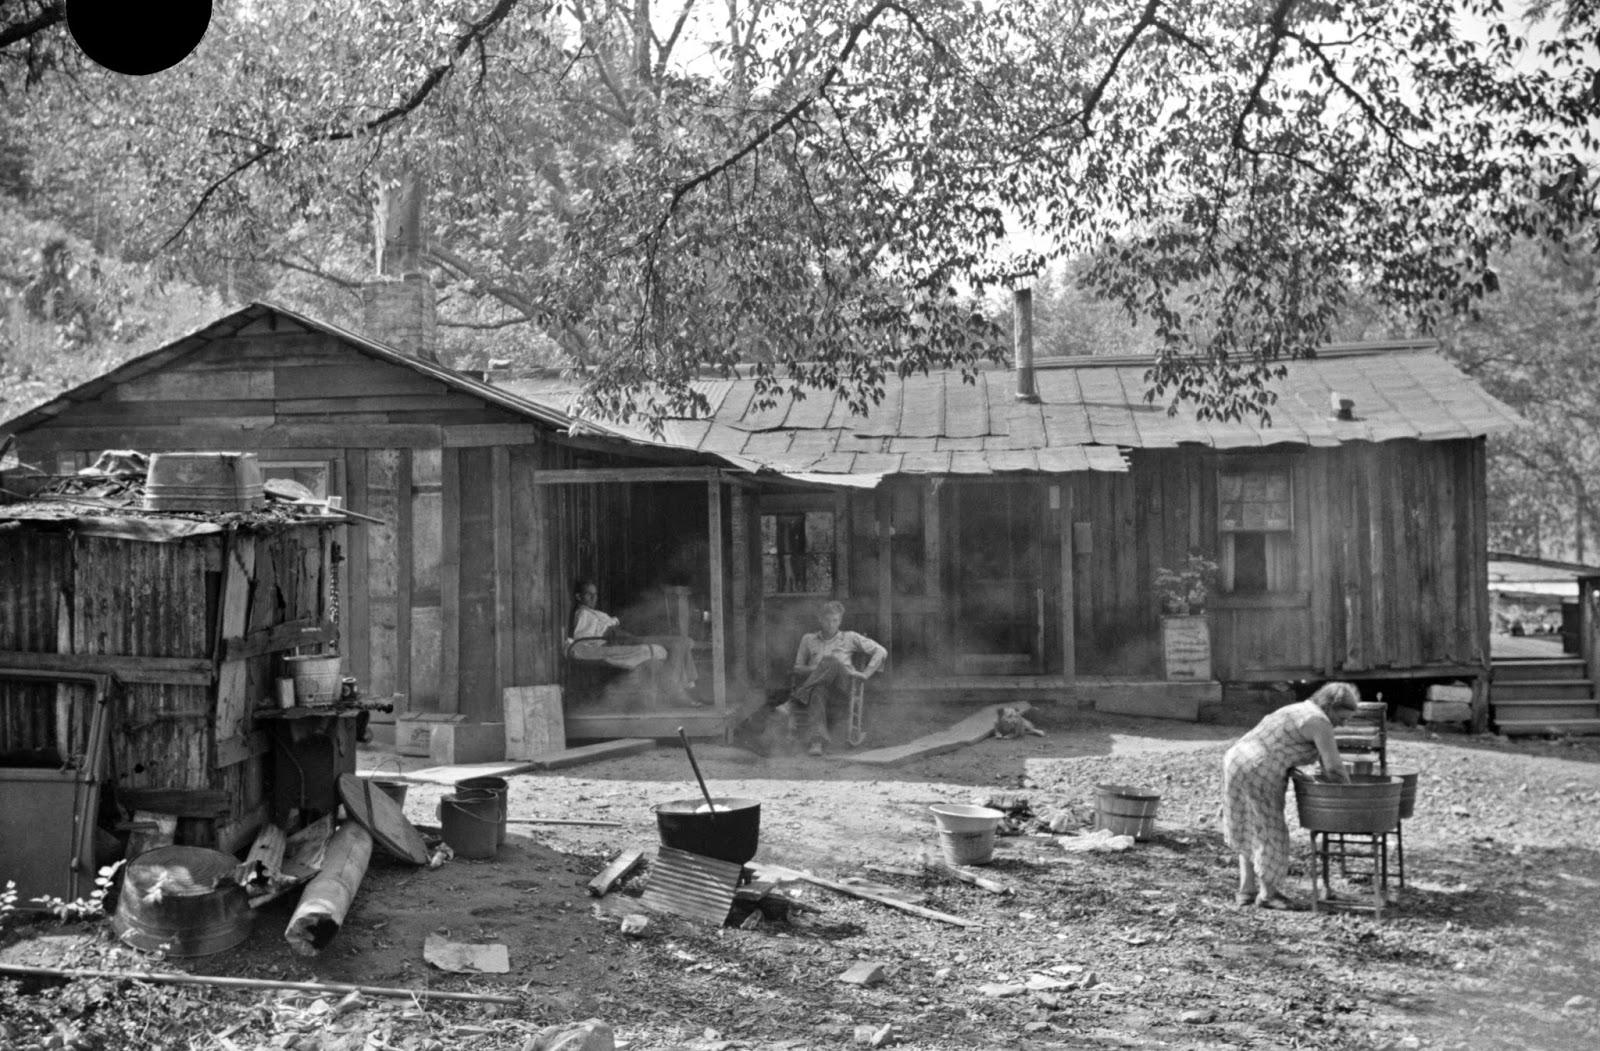 swingers in waynesburg pennsylvania